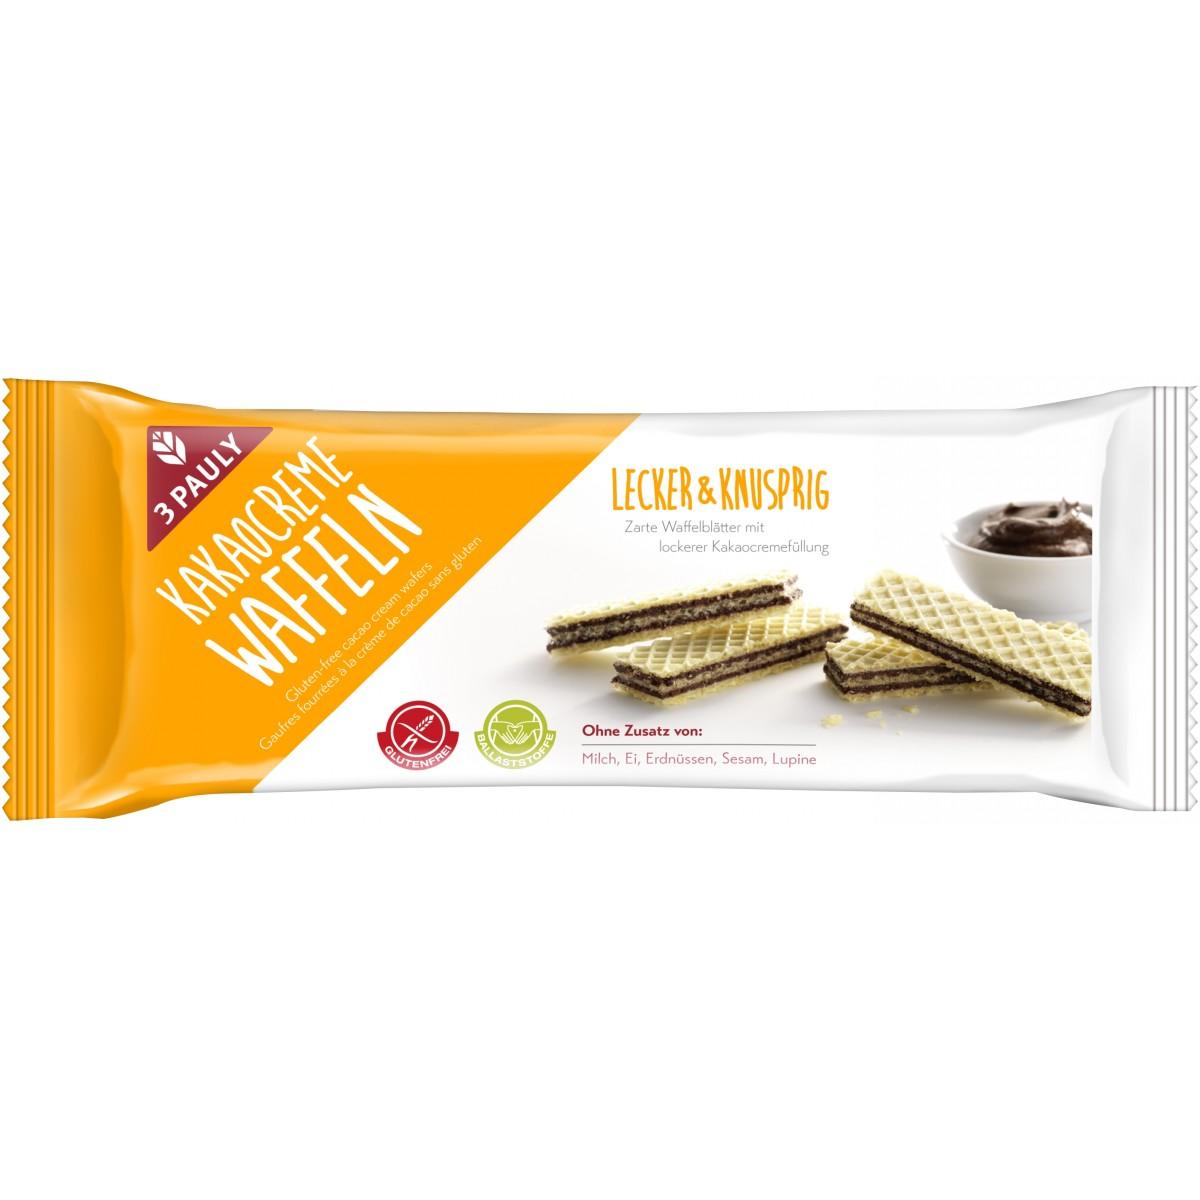 Chocoladecreme Wafels